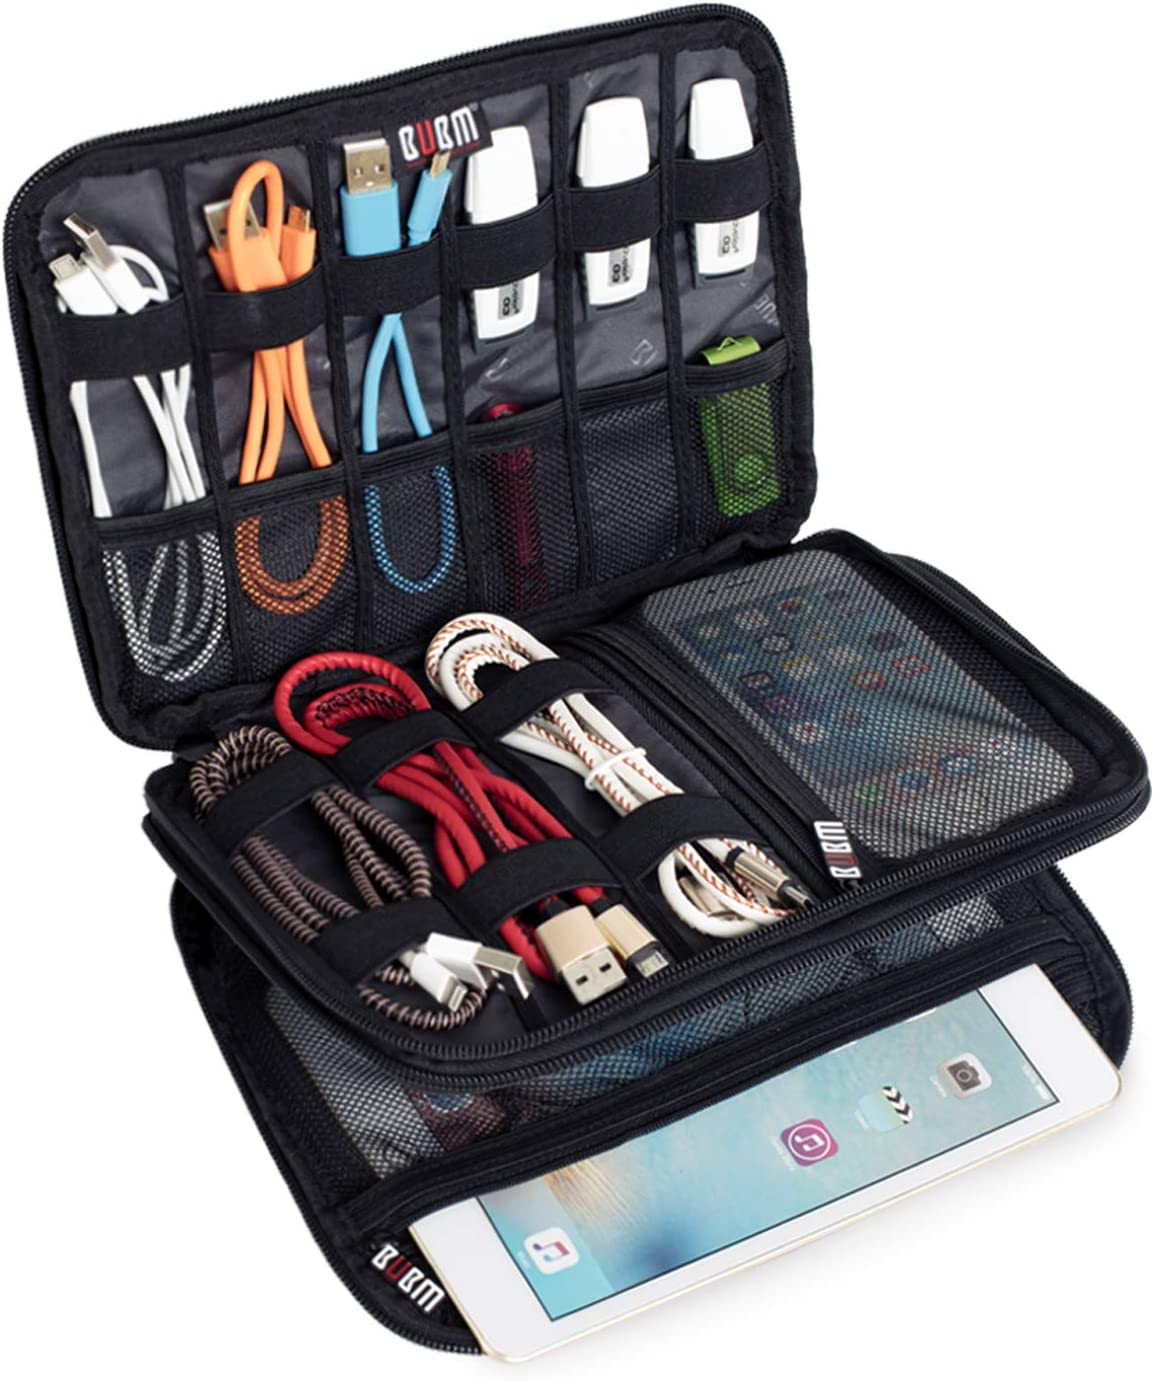 Medium, Black BUBM Double Layer Travel Gear Organiser//Electronics Accessories Bag